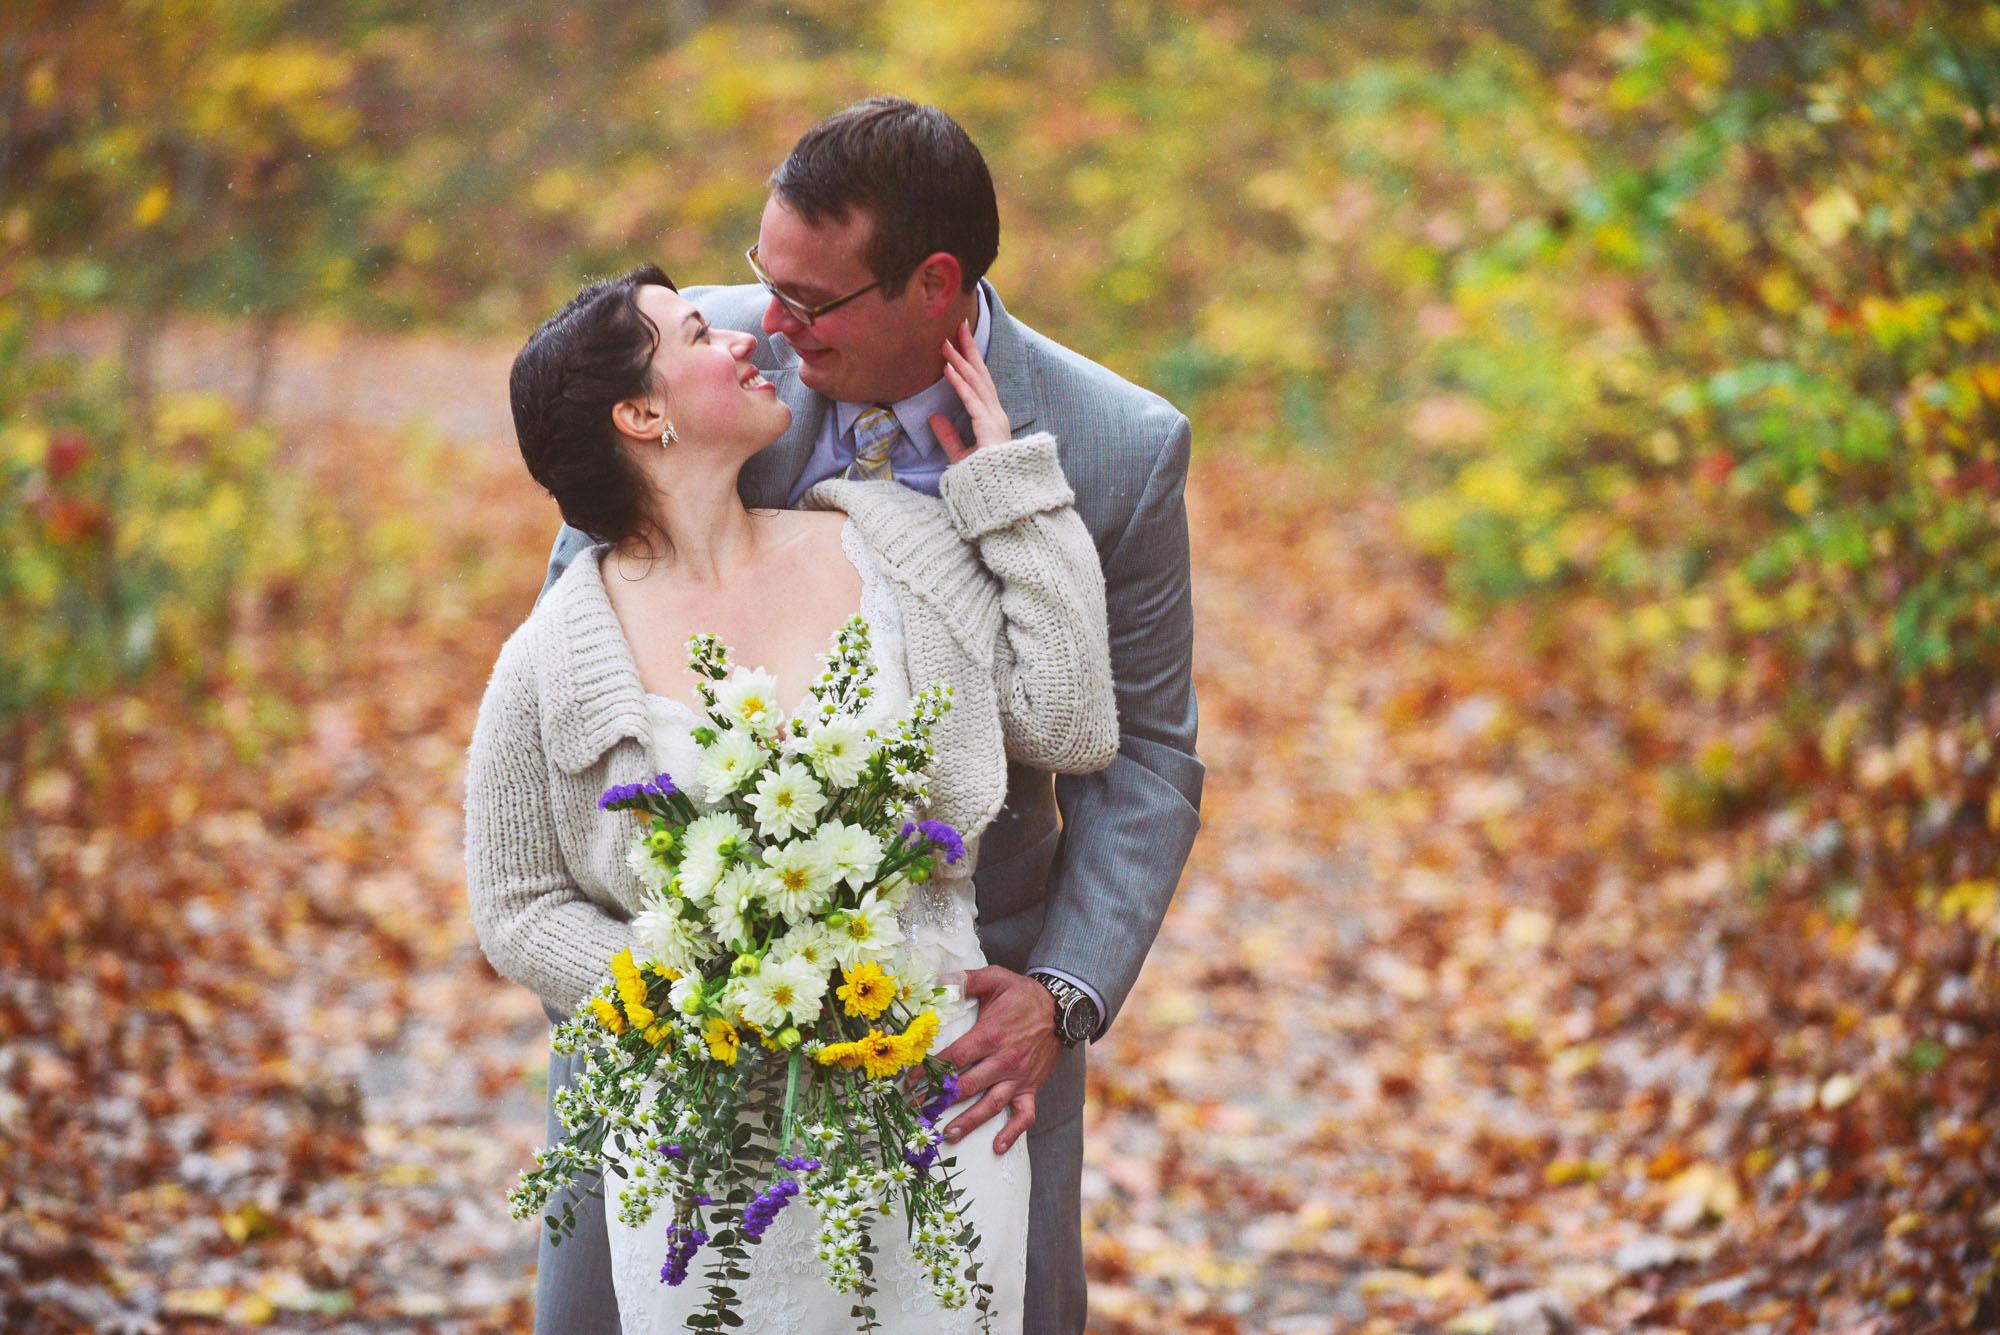 Julie + Chris | Sugarboo Farms Wedding (First Look)